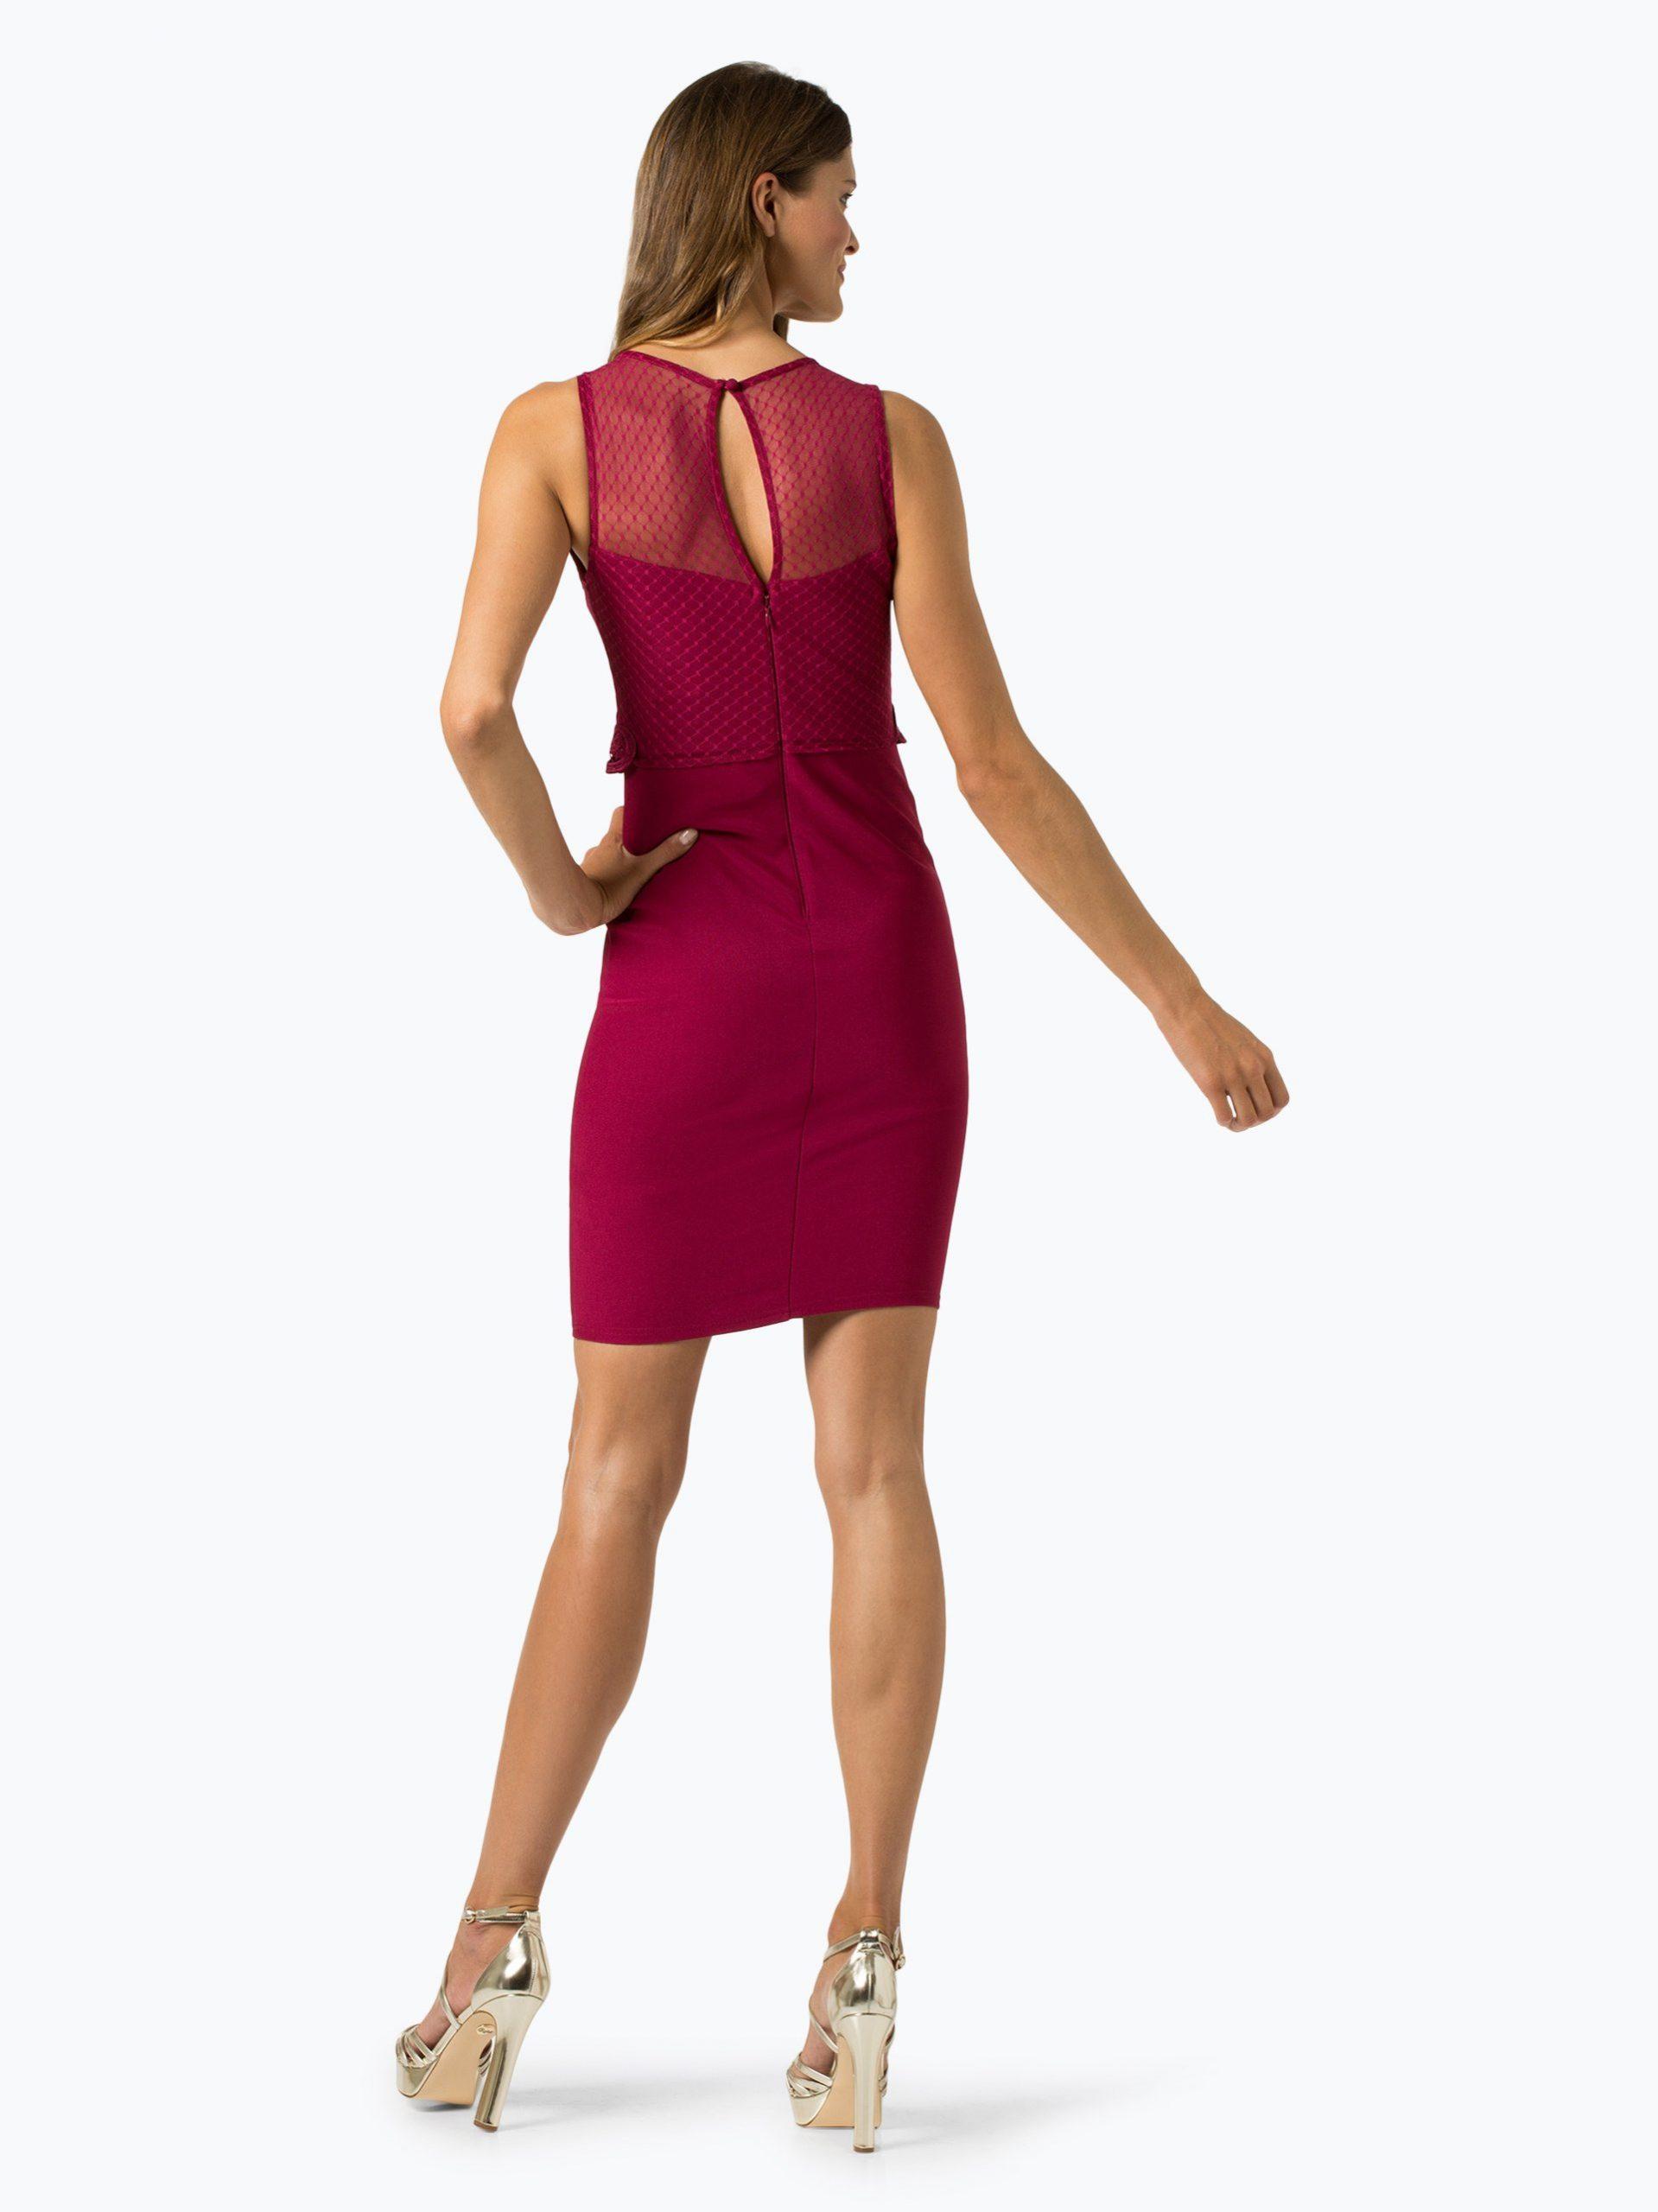 Lipsy Damen Kleid Online Kaufen  Peekundcloppenburgde